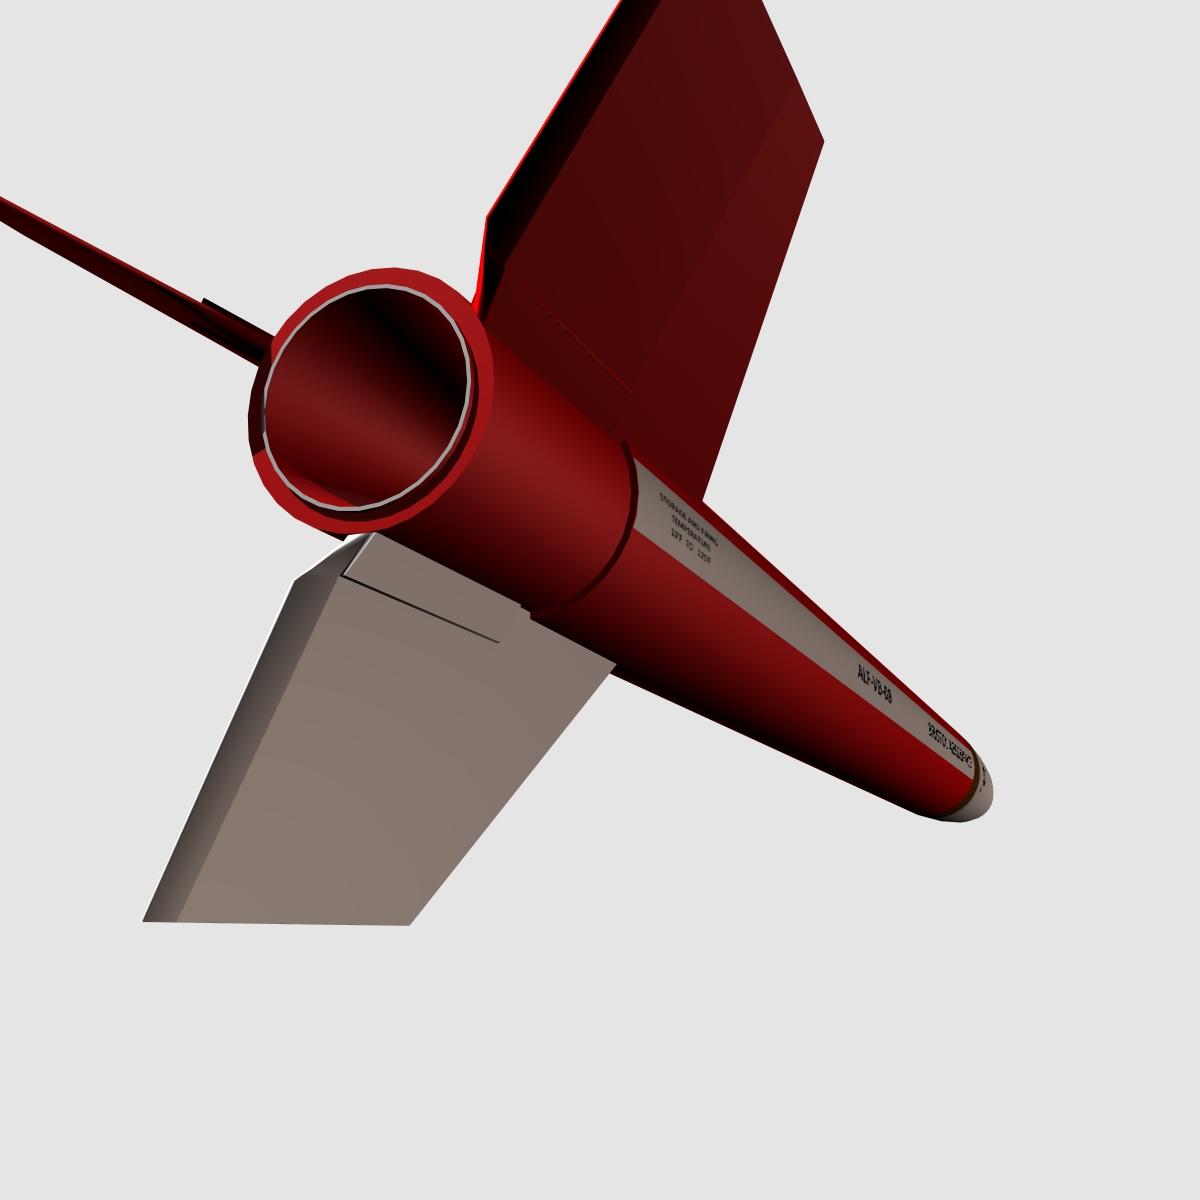 black brant vb sounding rocket 3d model 3ds dxf cob x obj 150876